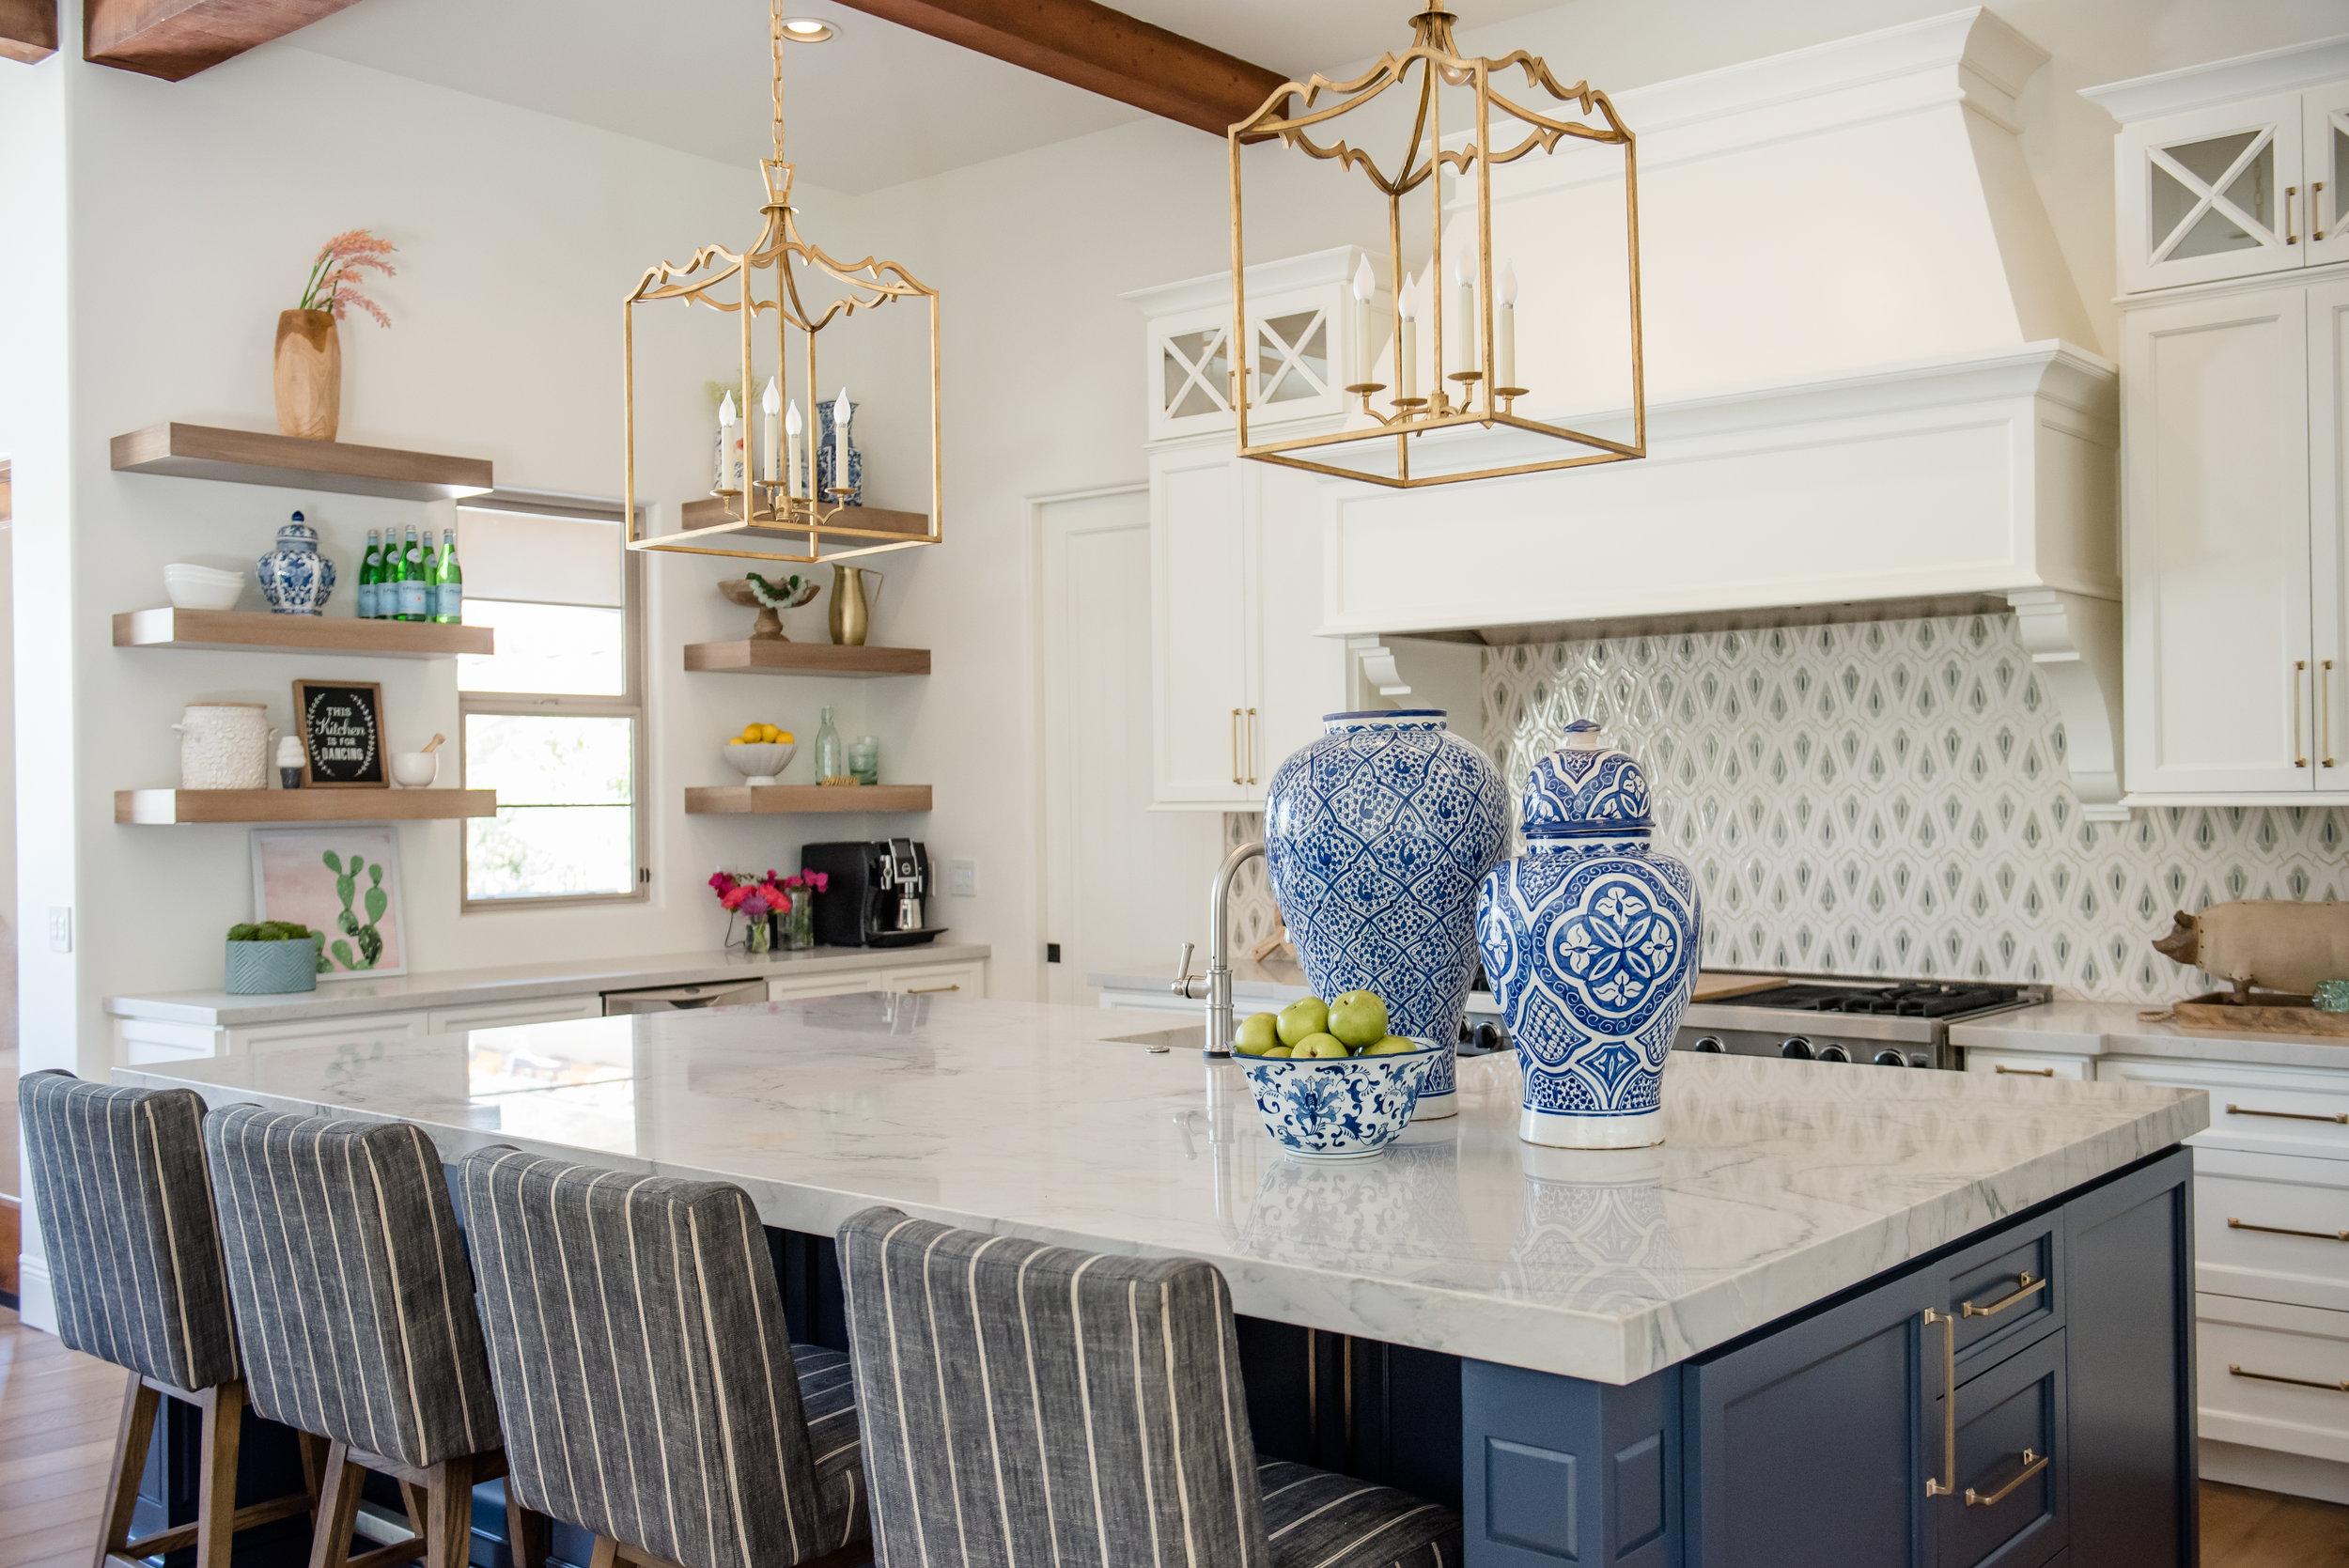 19+kitchen+hood+pots+stripedstools+navyblueisland+backsplashtile+openshelves+pendants+brasslighting.jpg